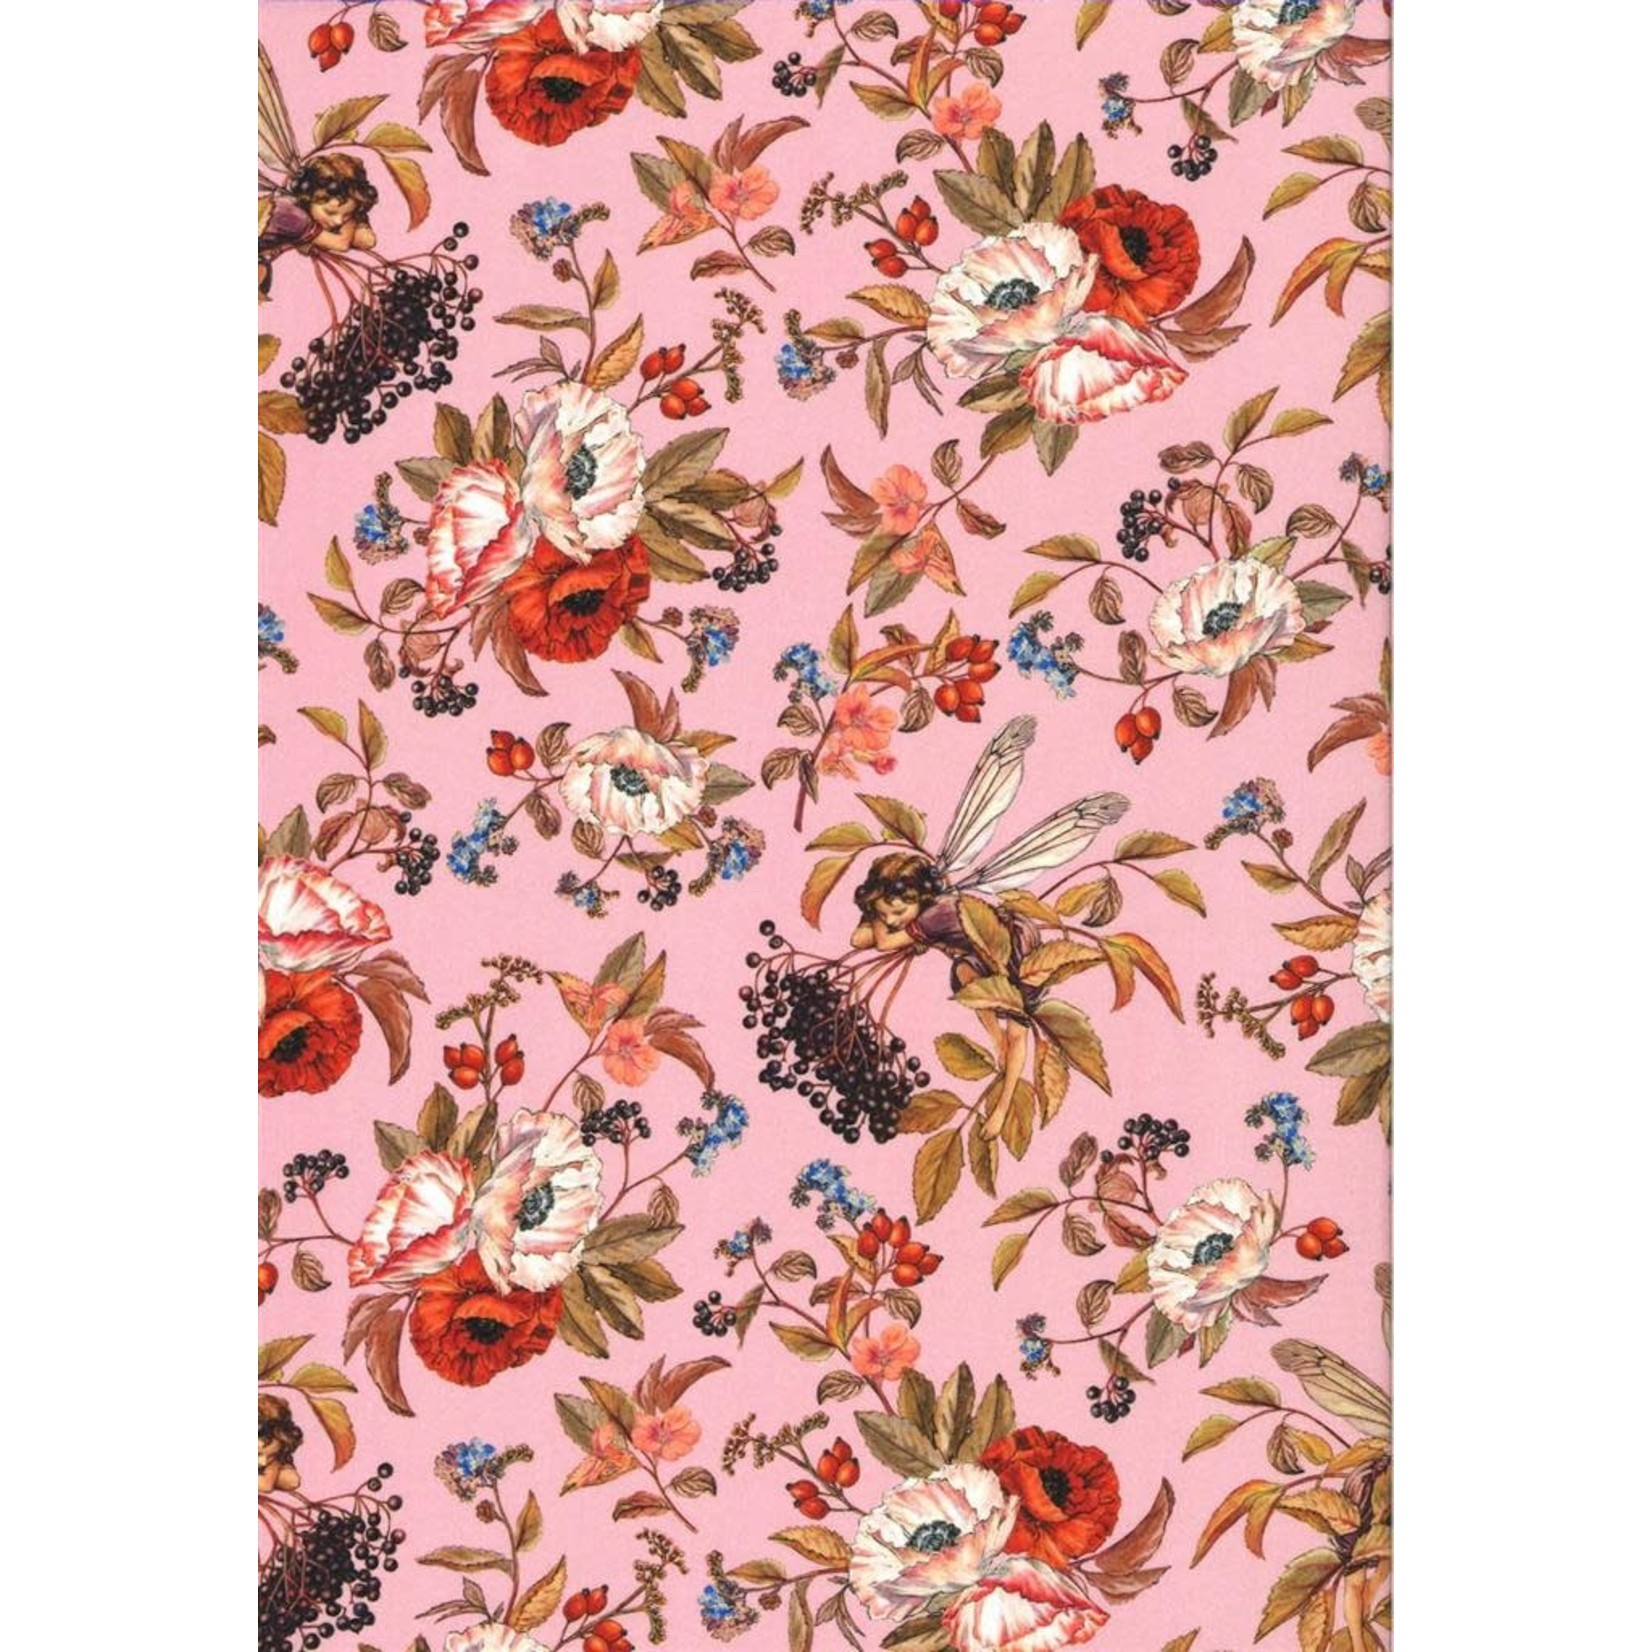 Michael Miller Elderberry Flower Fairies - Pink